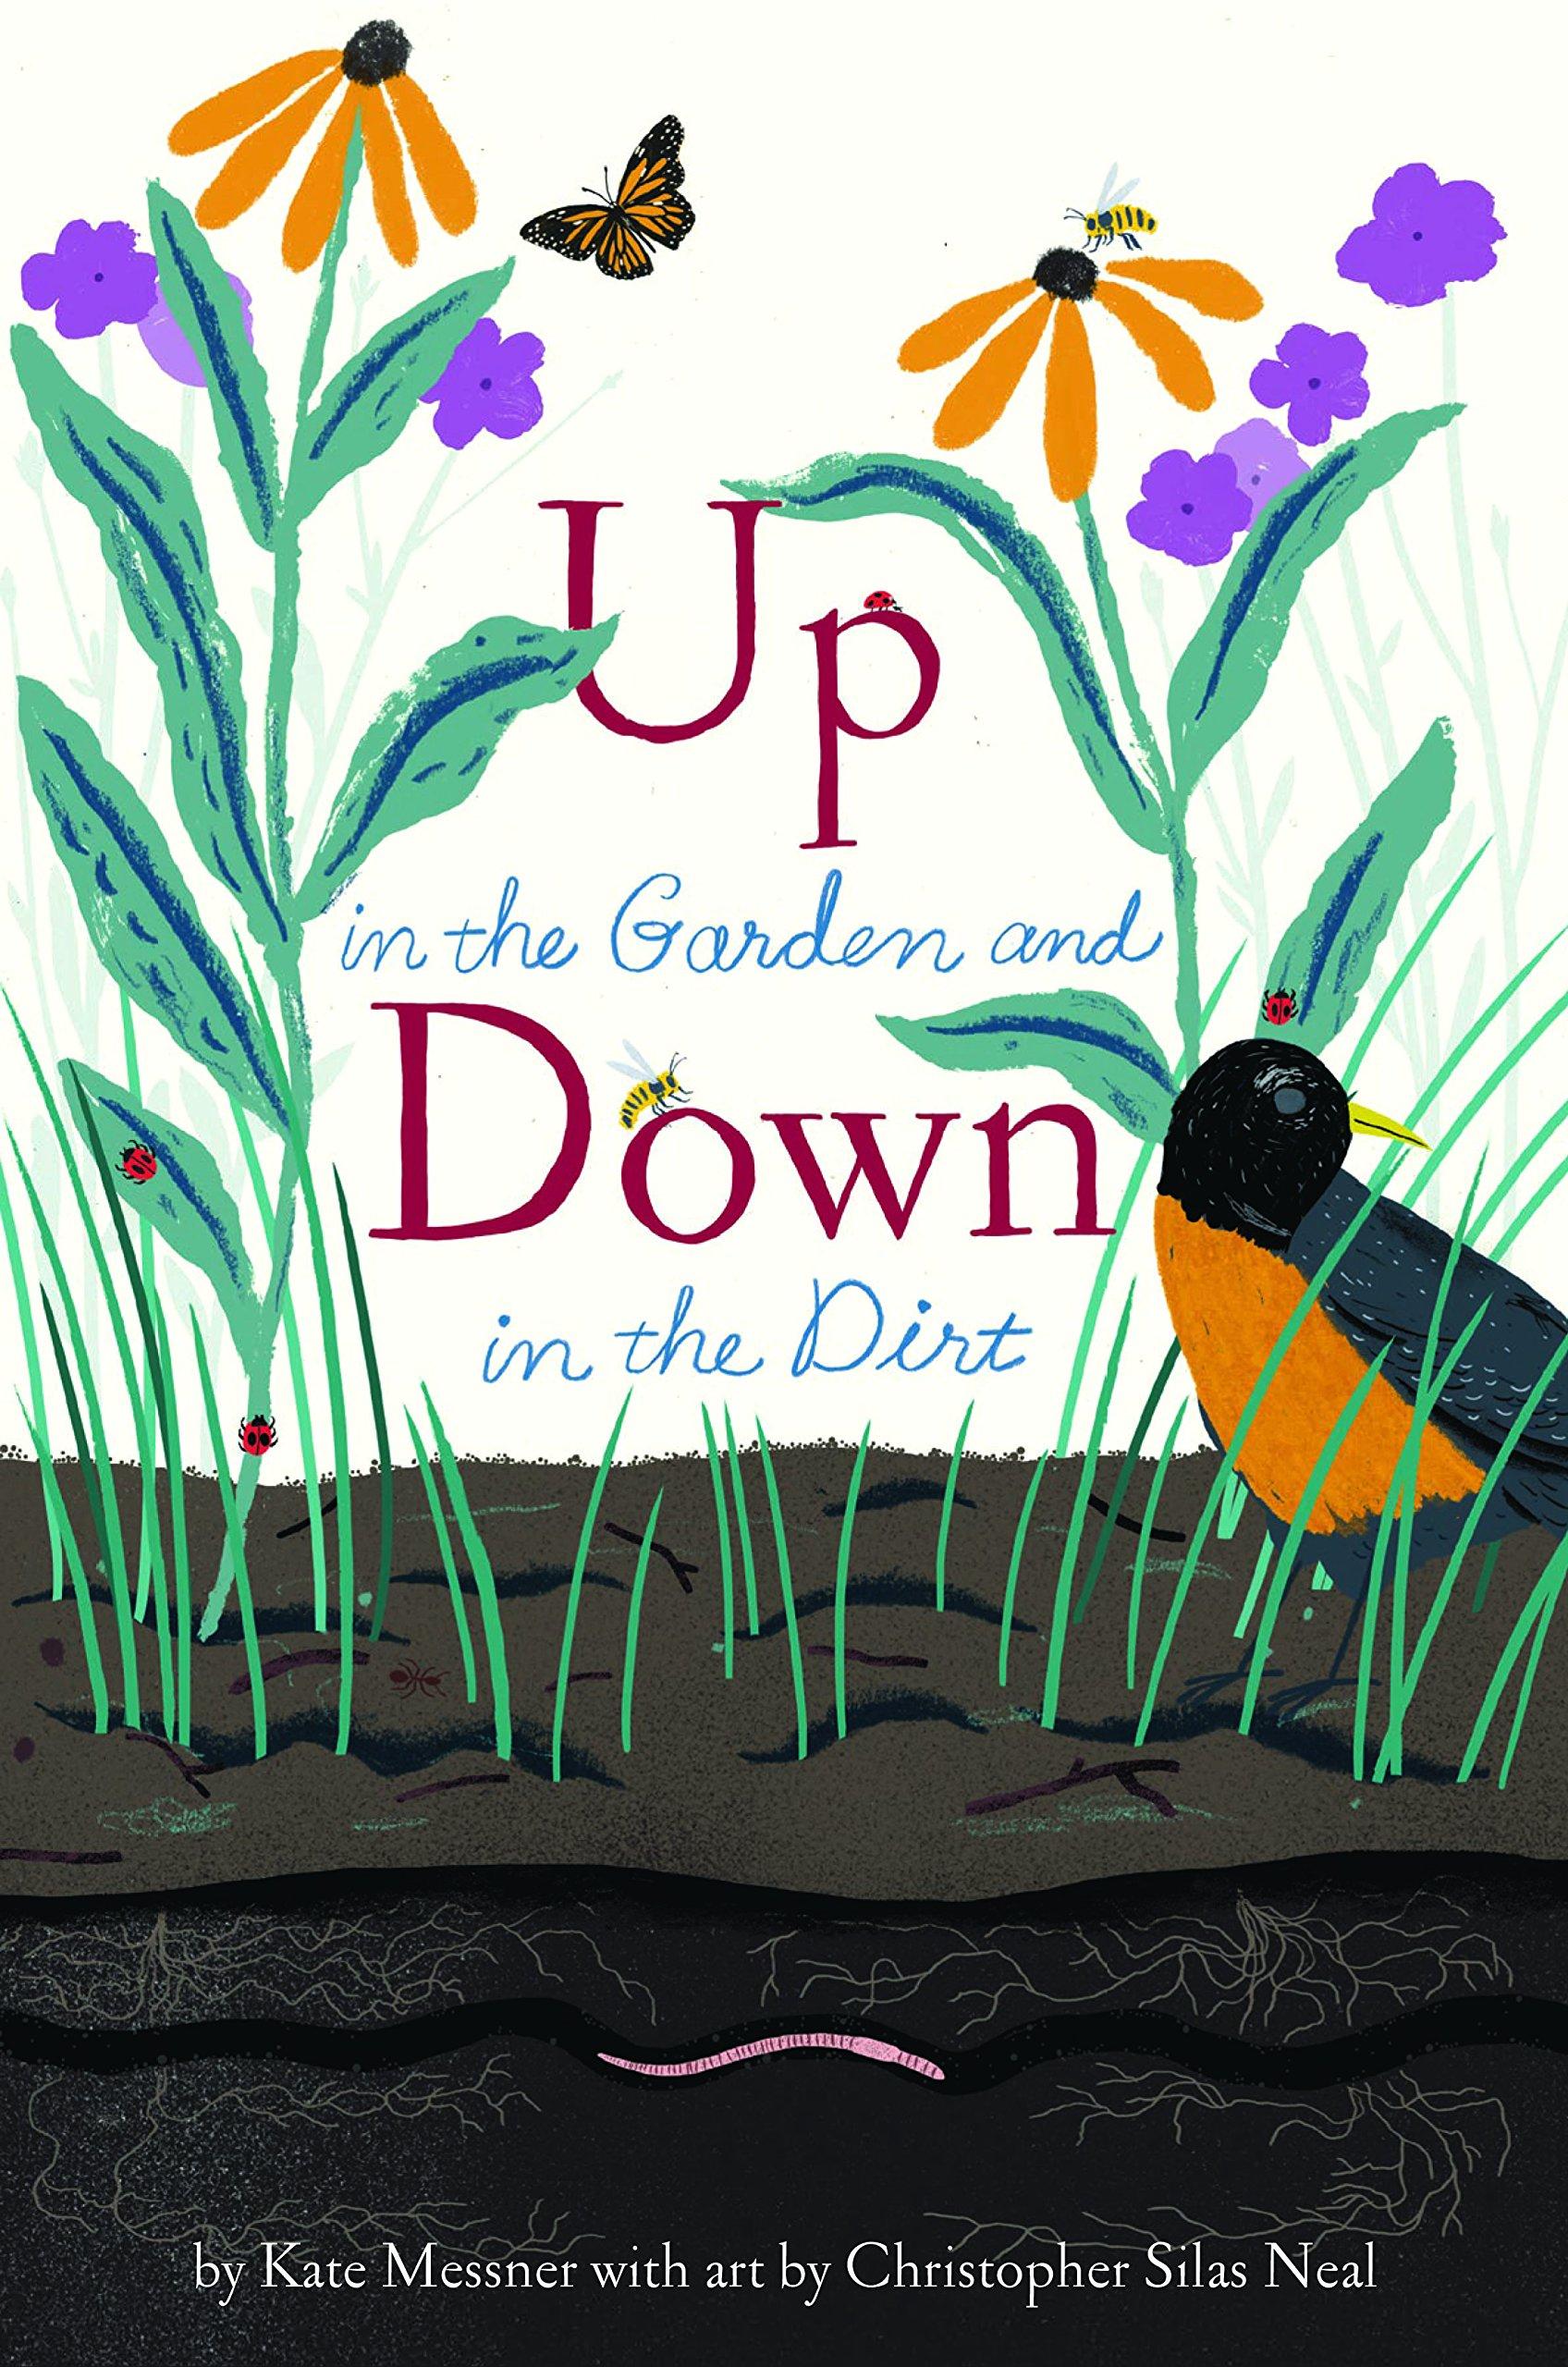 Garden Down Dirt Kate Messner